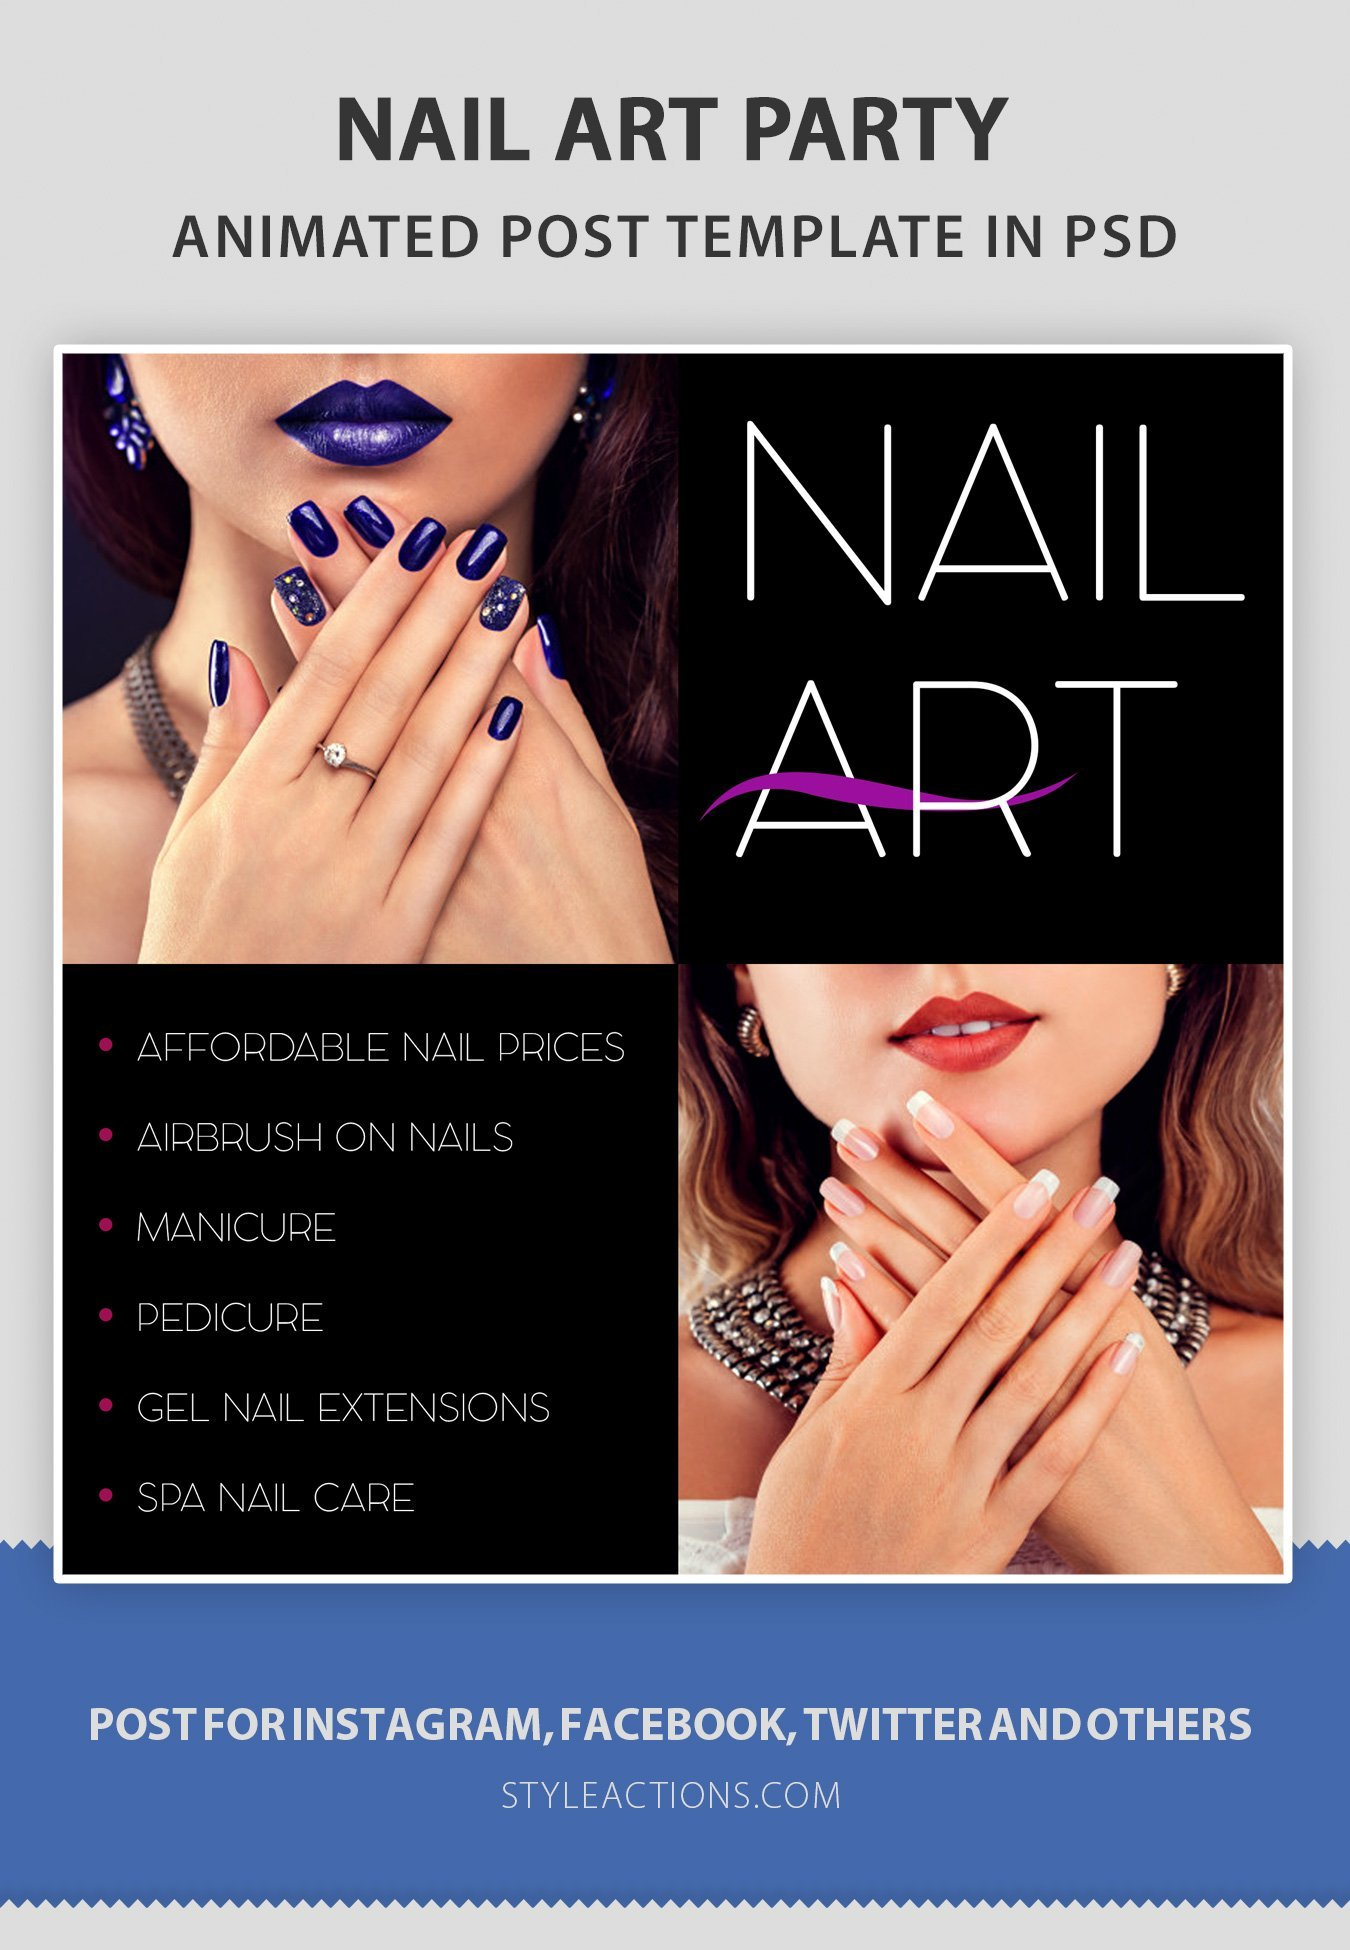 nailart-social-media-template